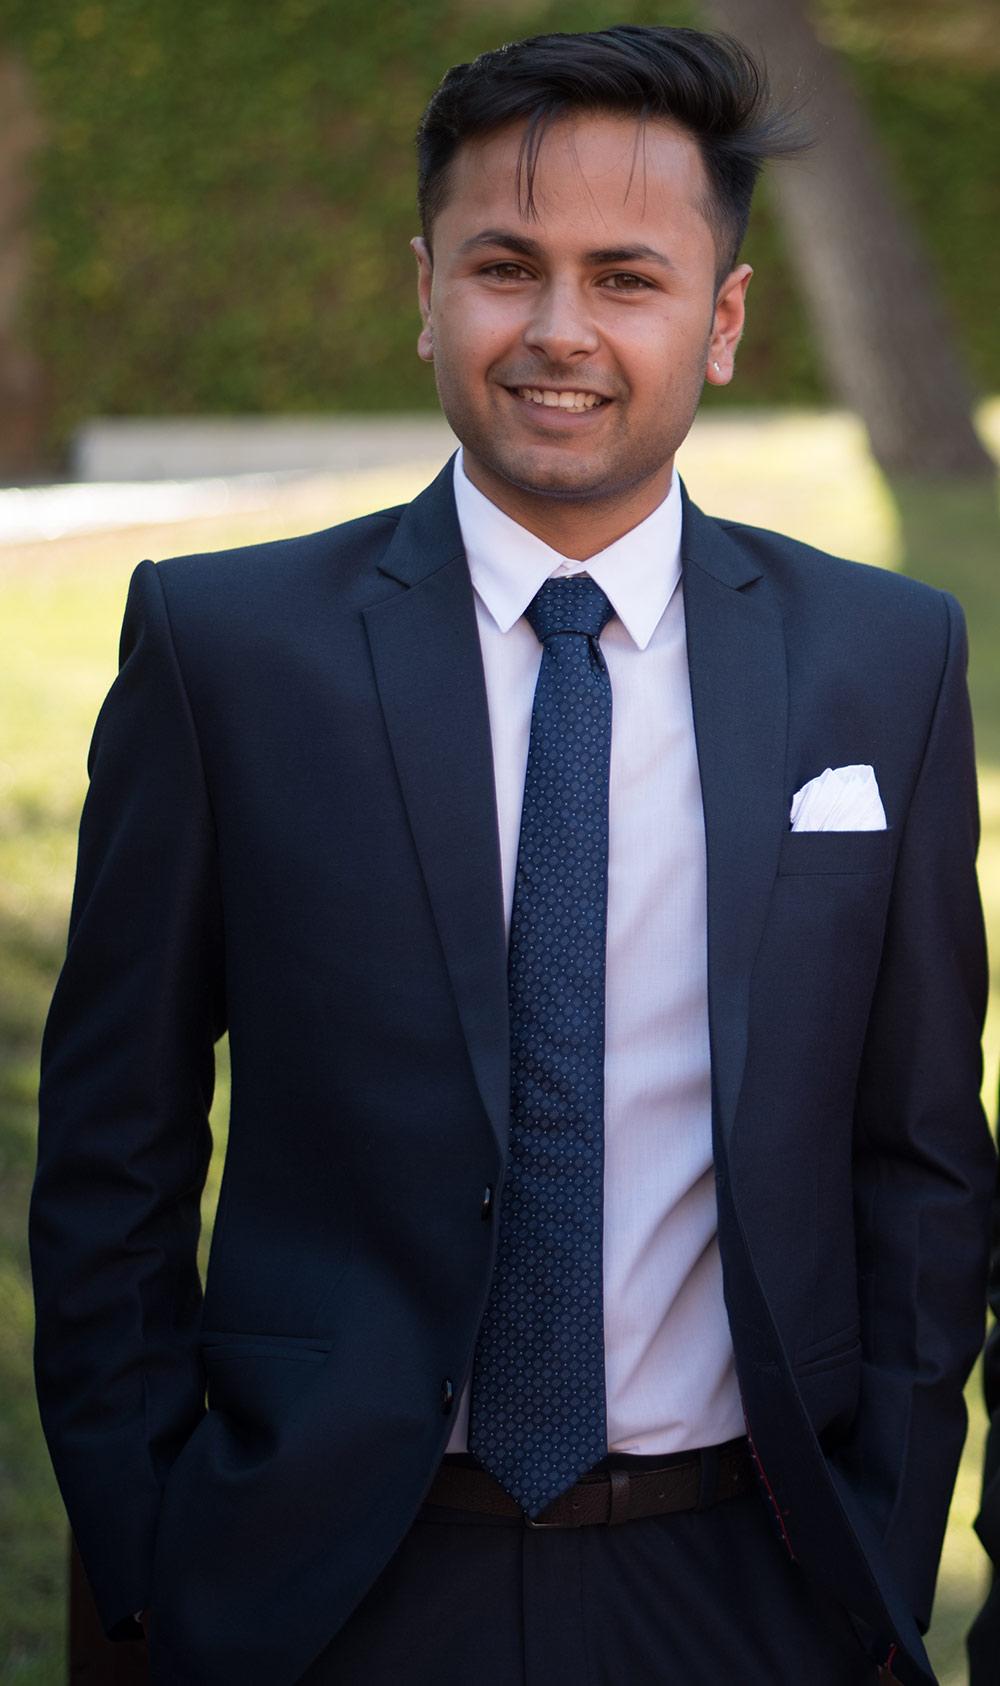 Ajay Shekhawat graduado en el programa International Master in Management, 2017.